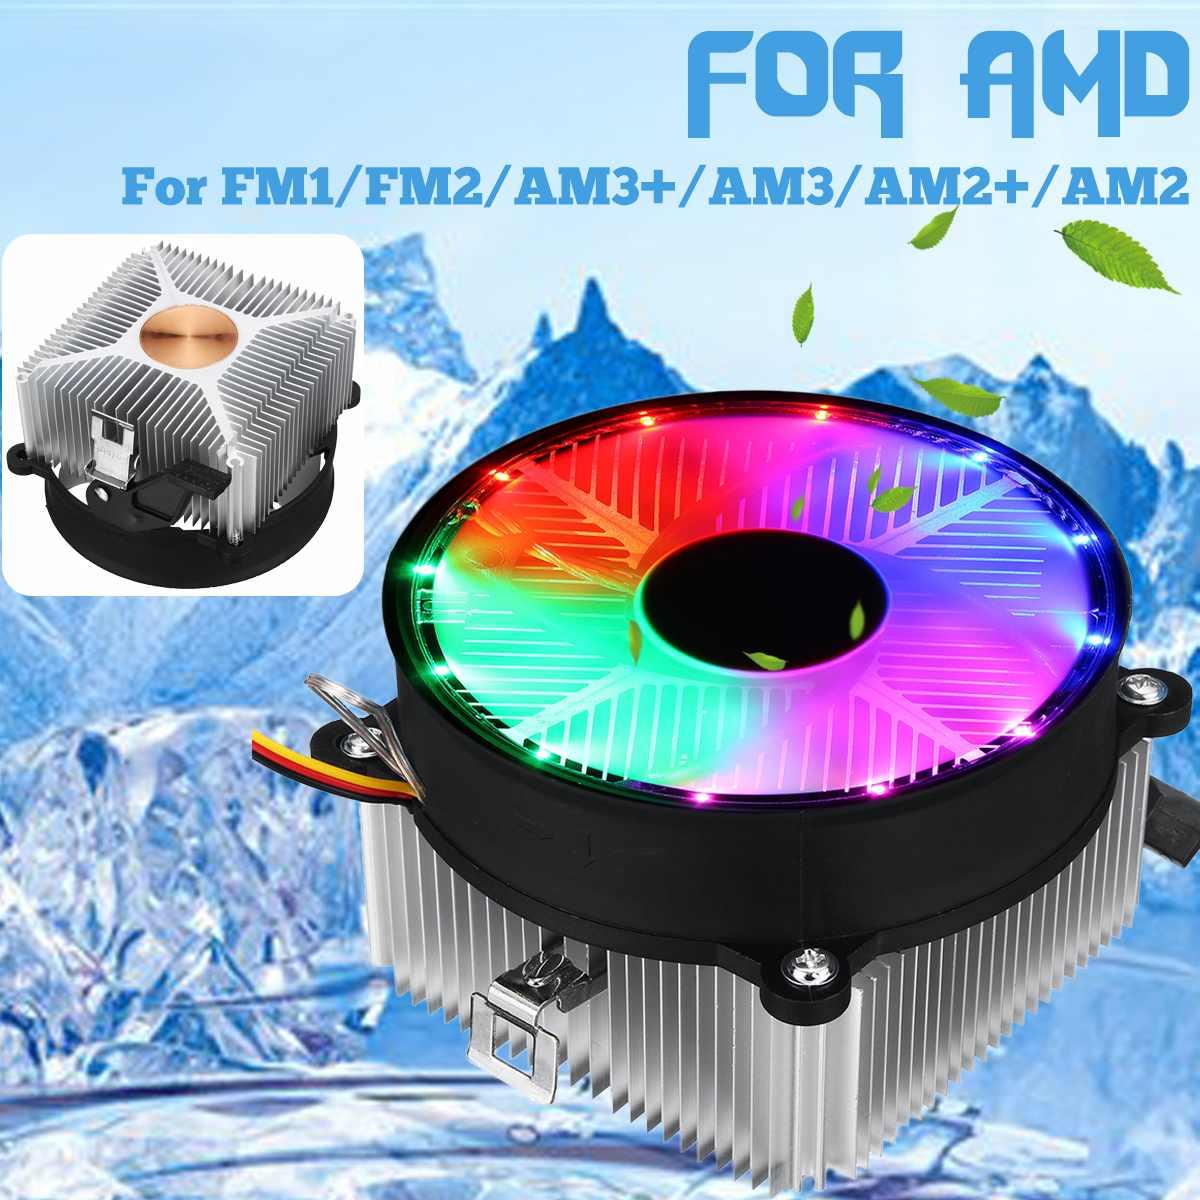 S Skyee Cpu Cooler Cooling Fan Led Cooling Heatsink Quiet 3pin Fan Radiator Heatsink Universal For Amd Fm1 Fm2 Am3 Am3 Am2 Am2 Aliexpress Com Imall Com